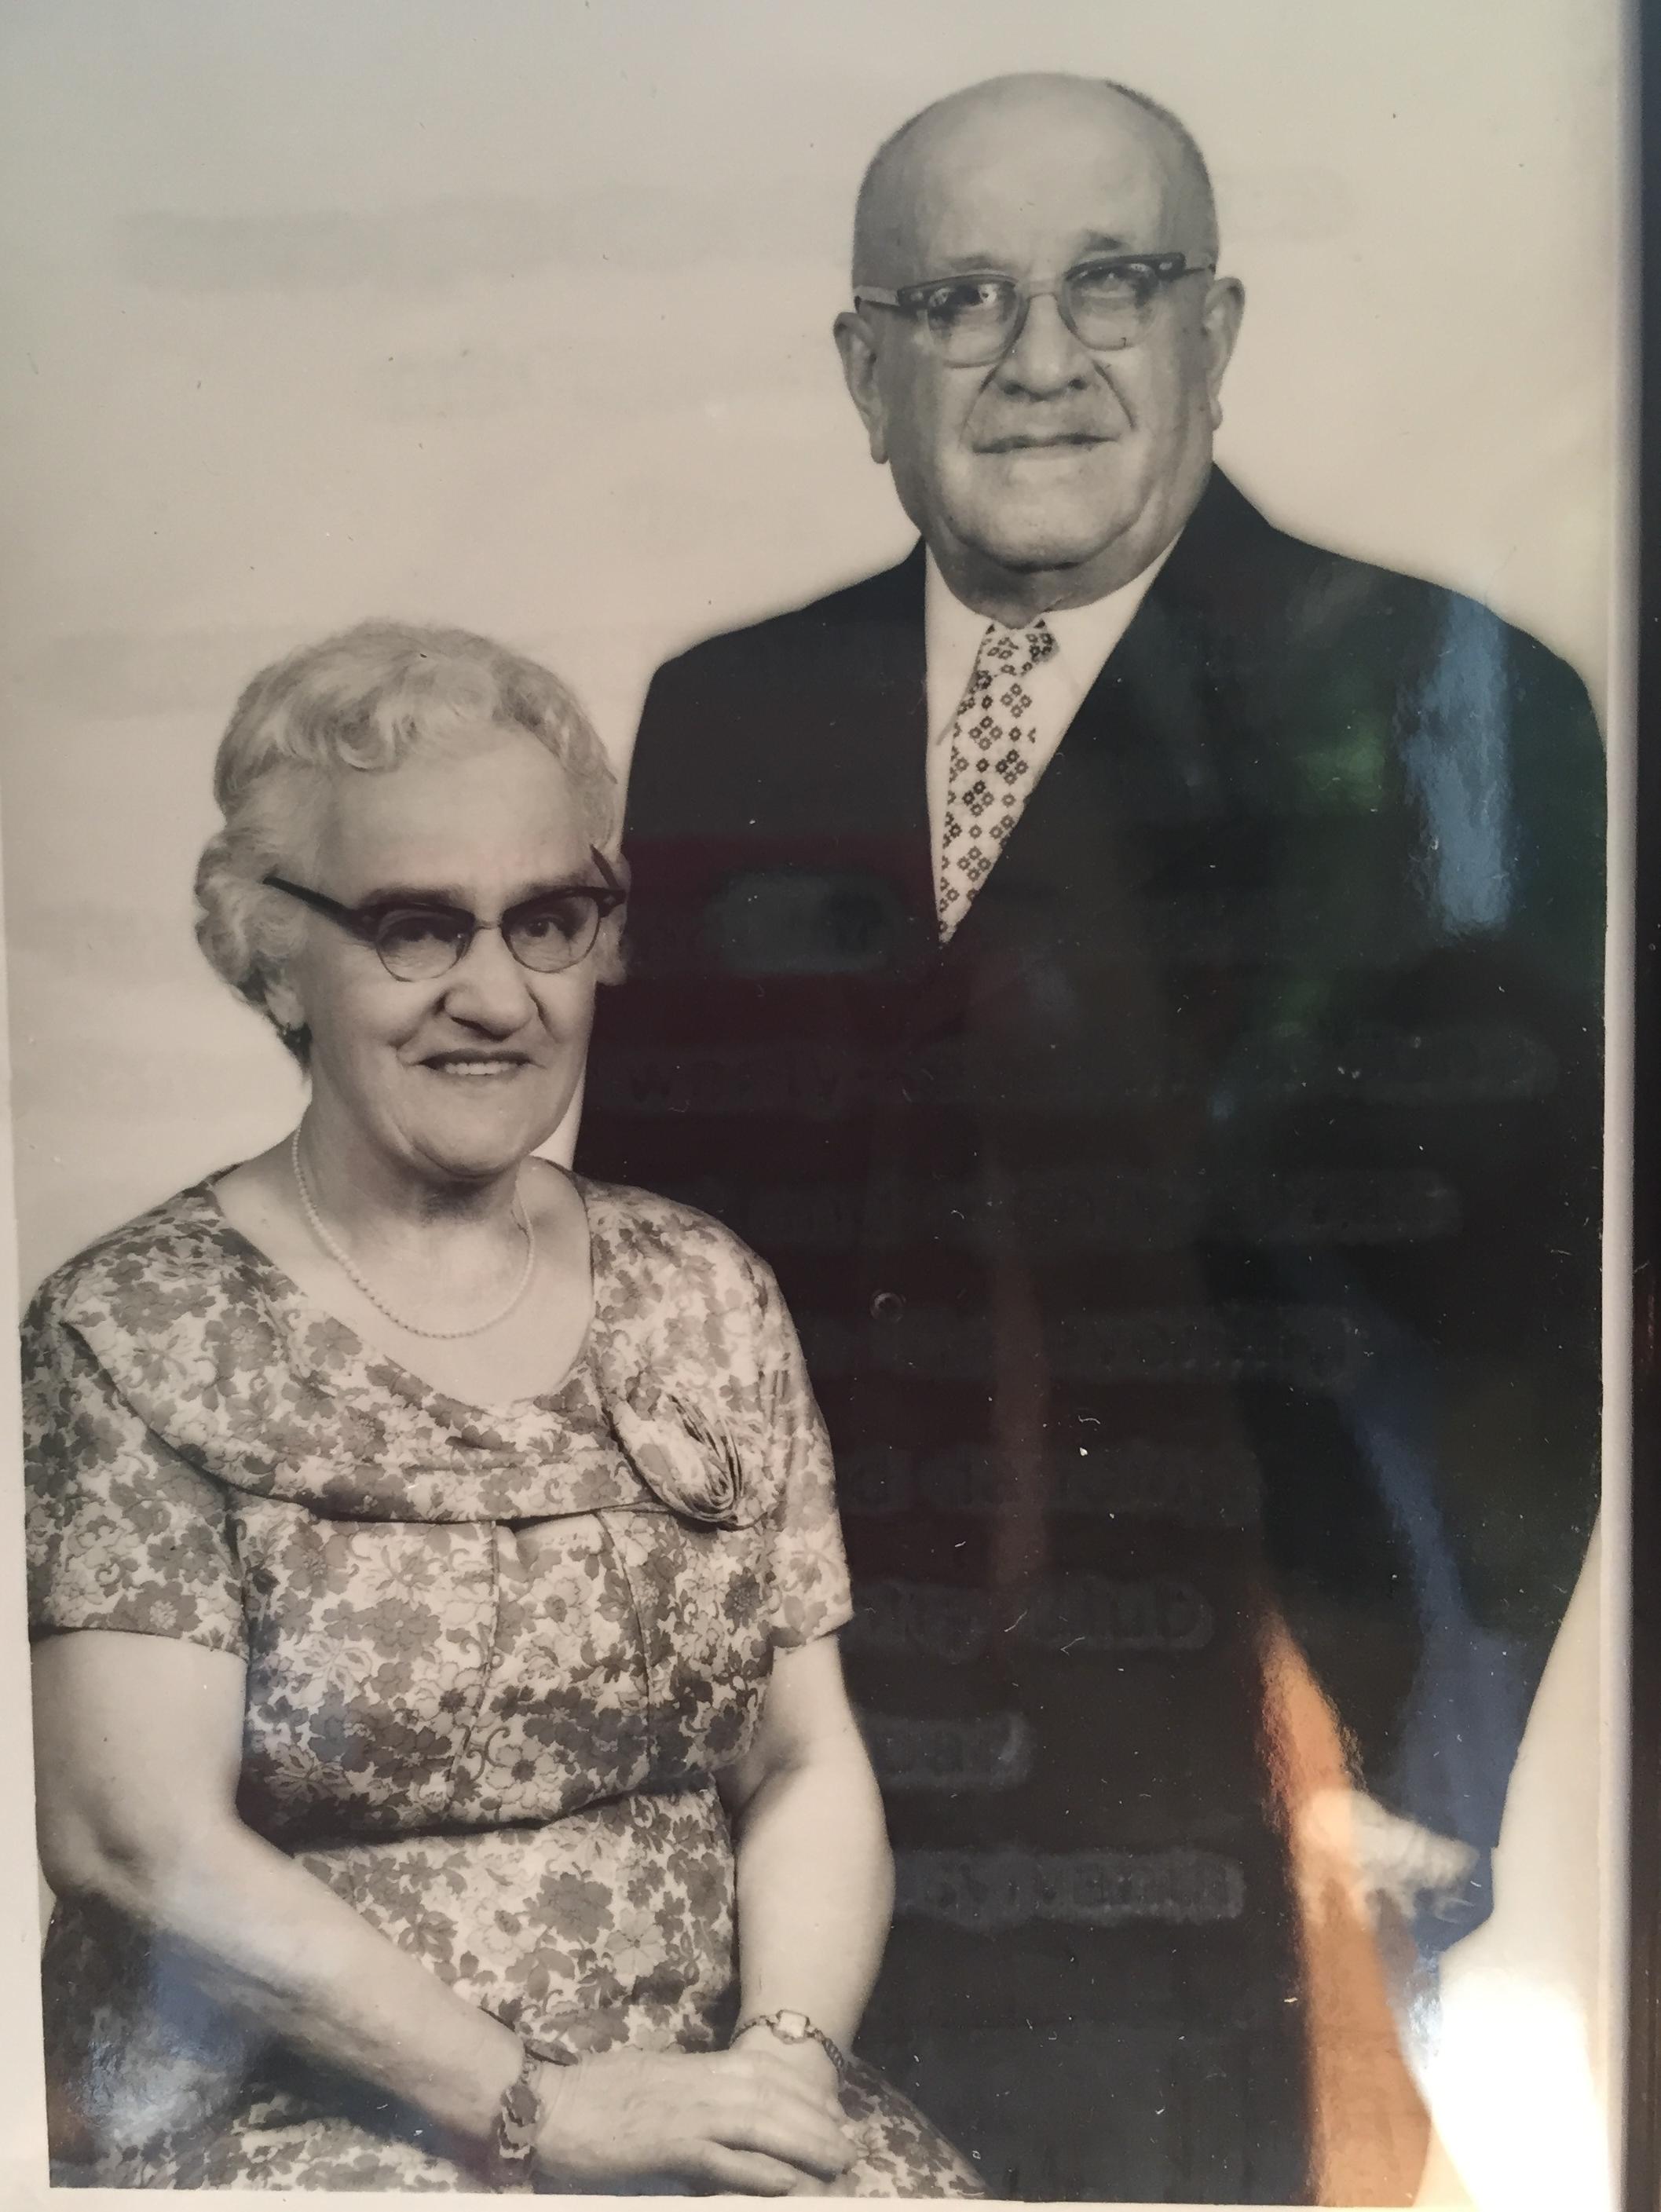 my Italian great-grandparents, Nicola and Jennie Romito